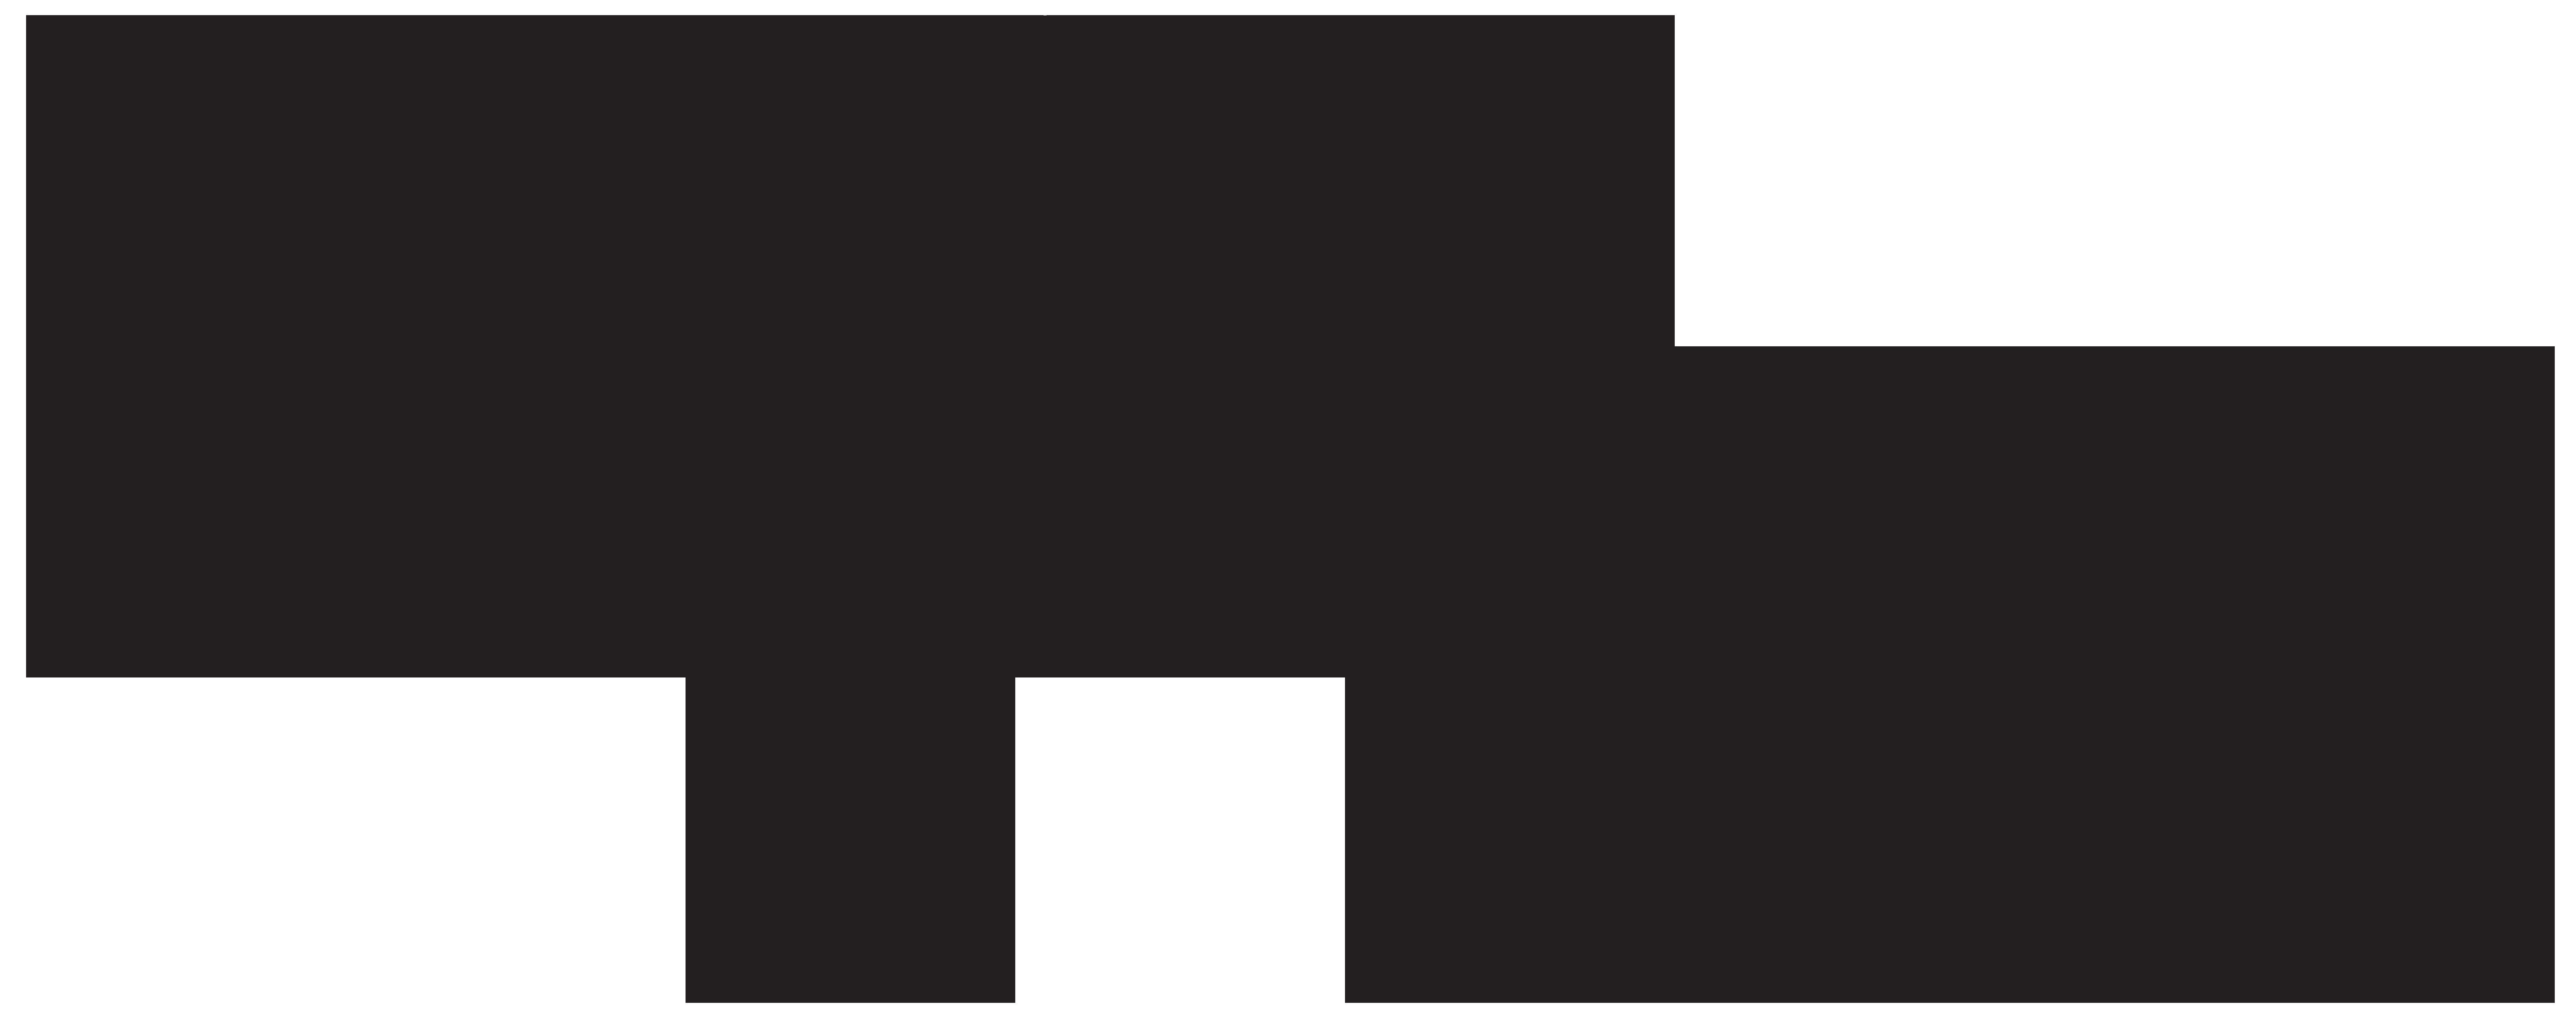 Shark Tail Drawing